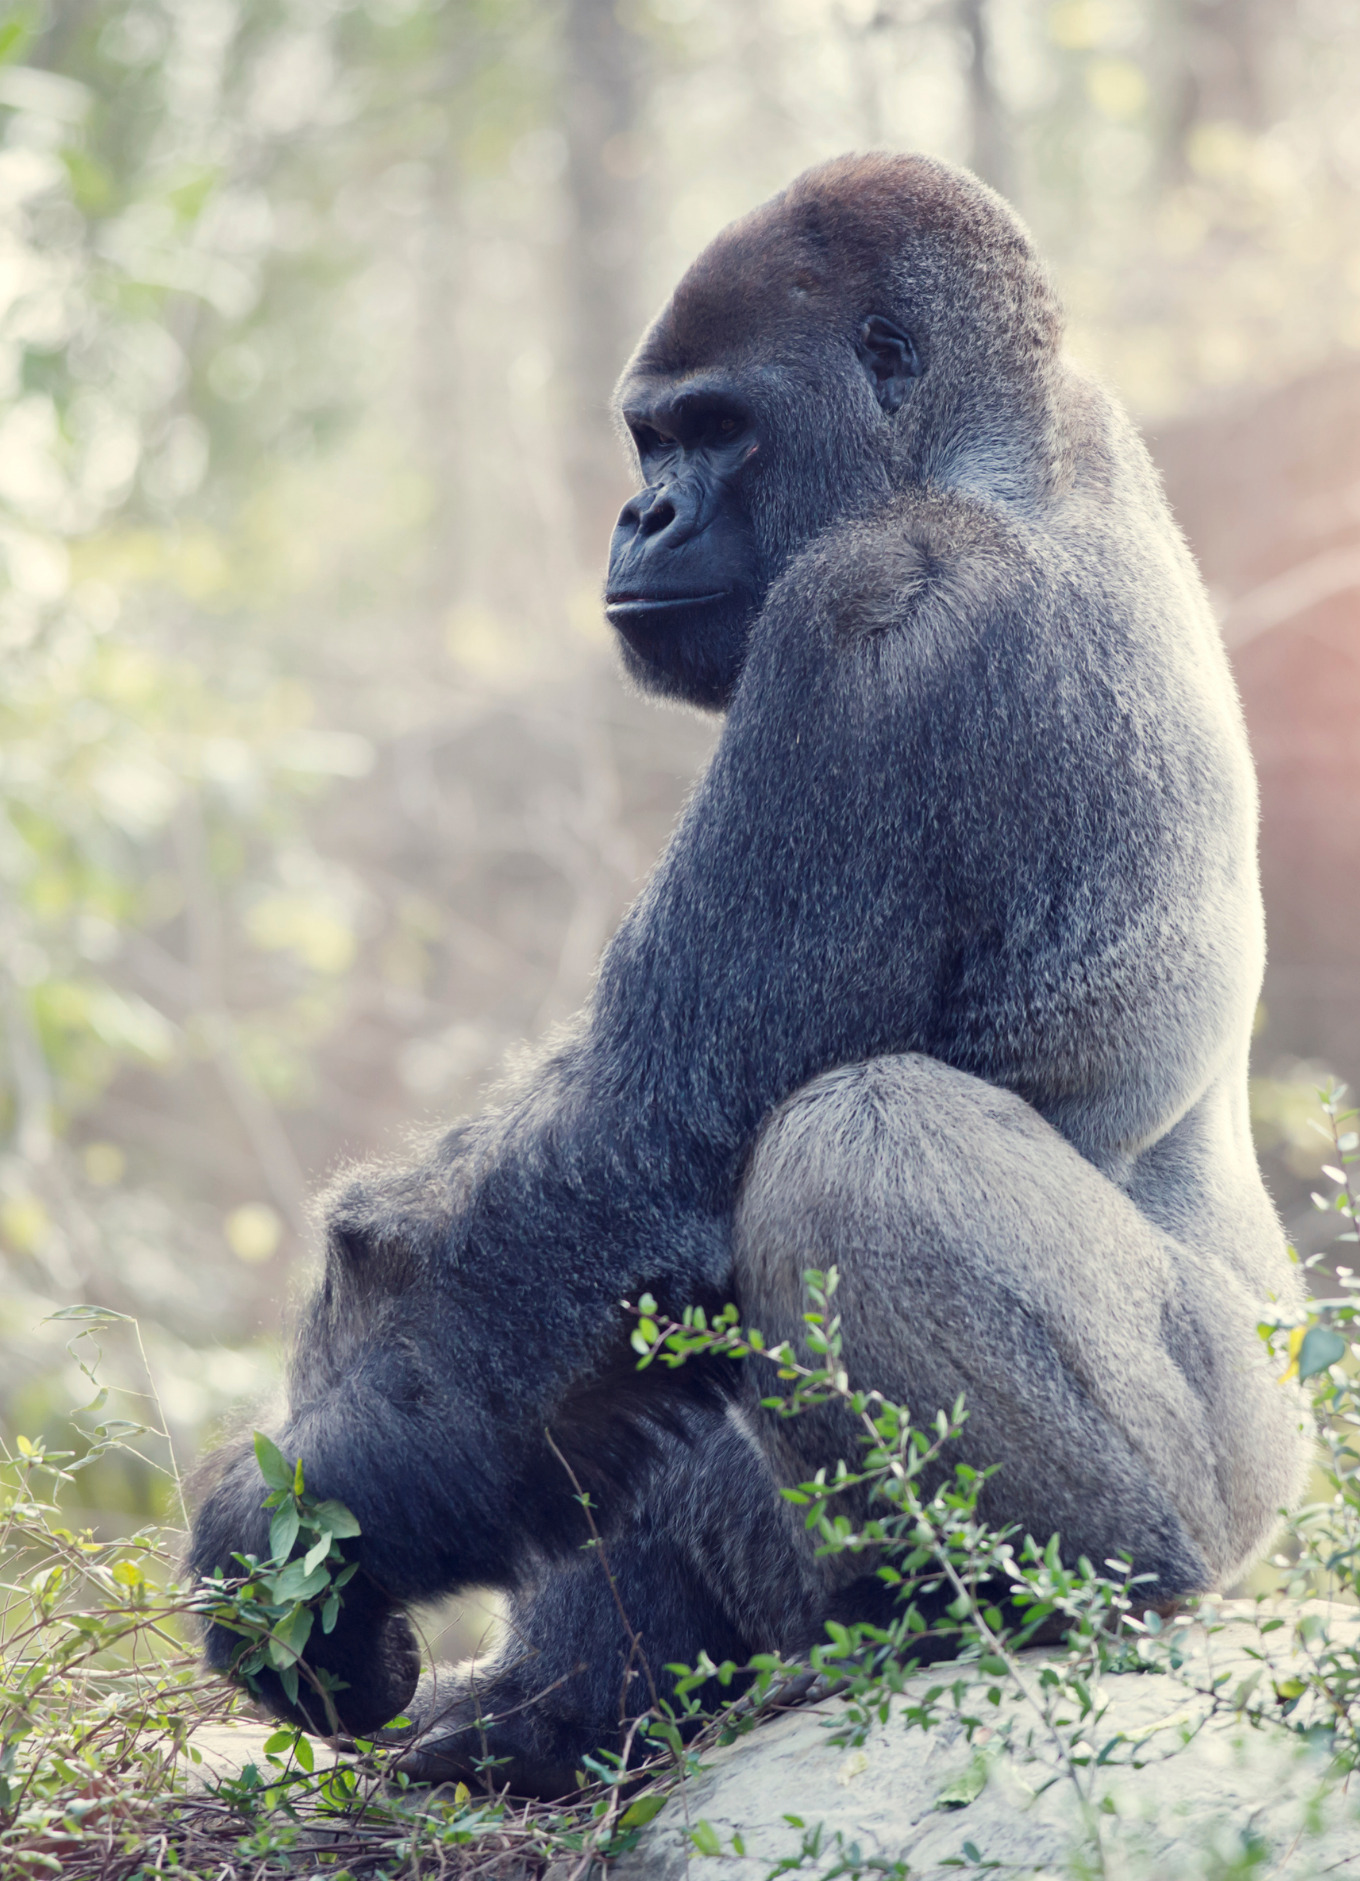 Stock photo of a black gorilla